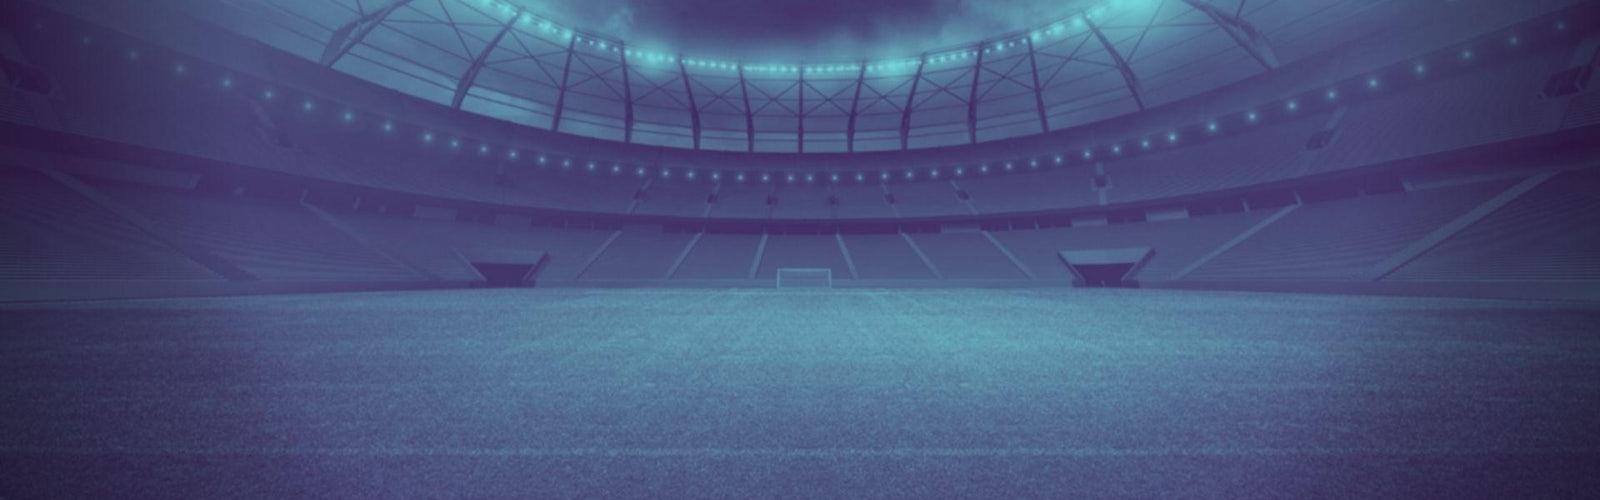 Sportwetten Promotions Angebote Header